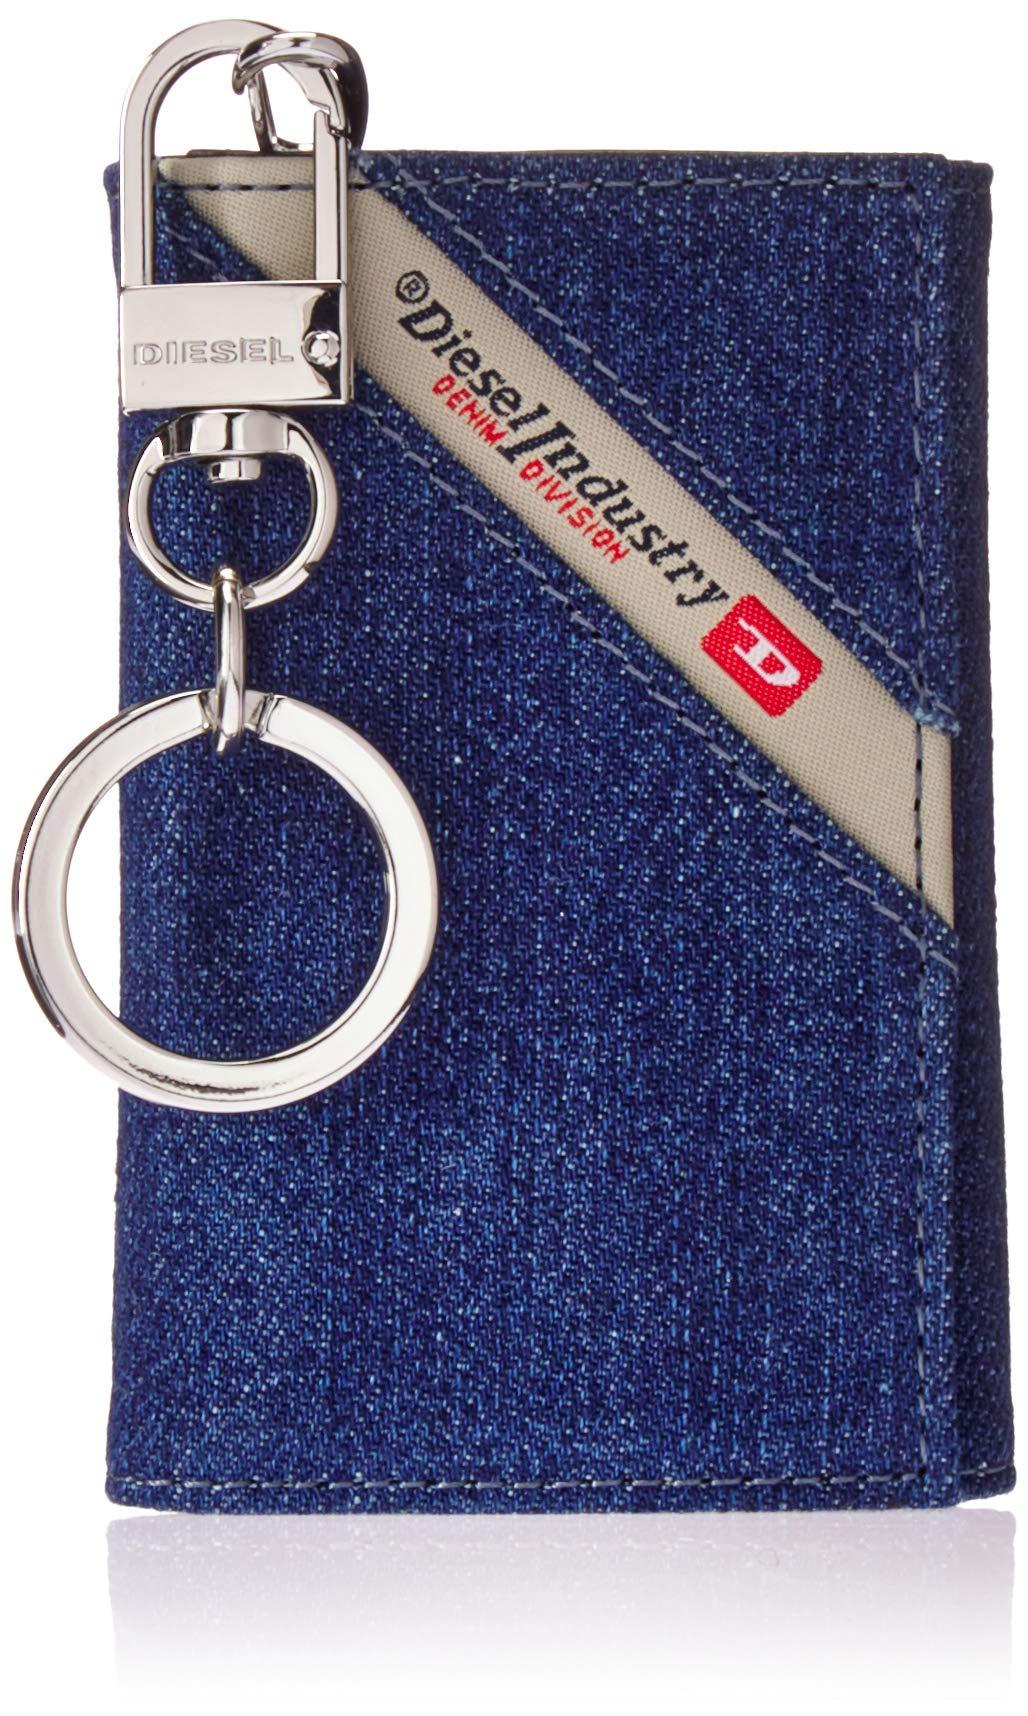 Diesel Men's DENIMLINE KEYCASE O-Key Holder, dark blue denim/black One Size